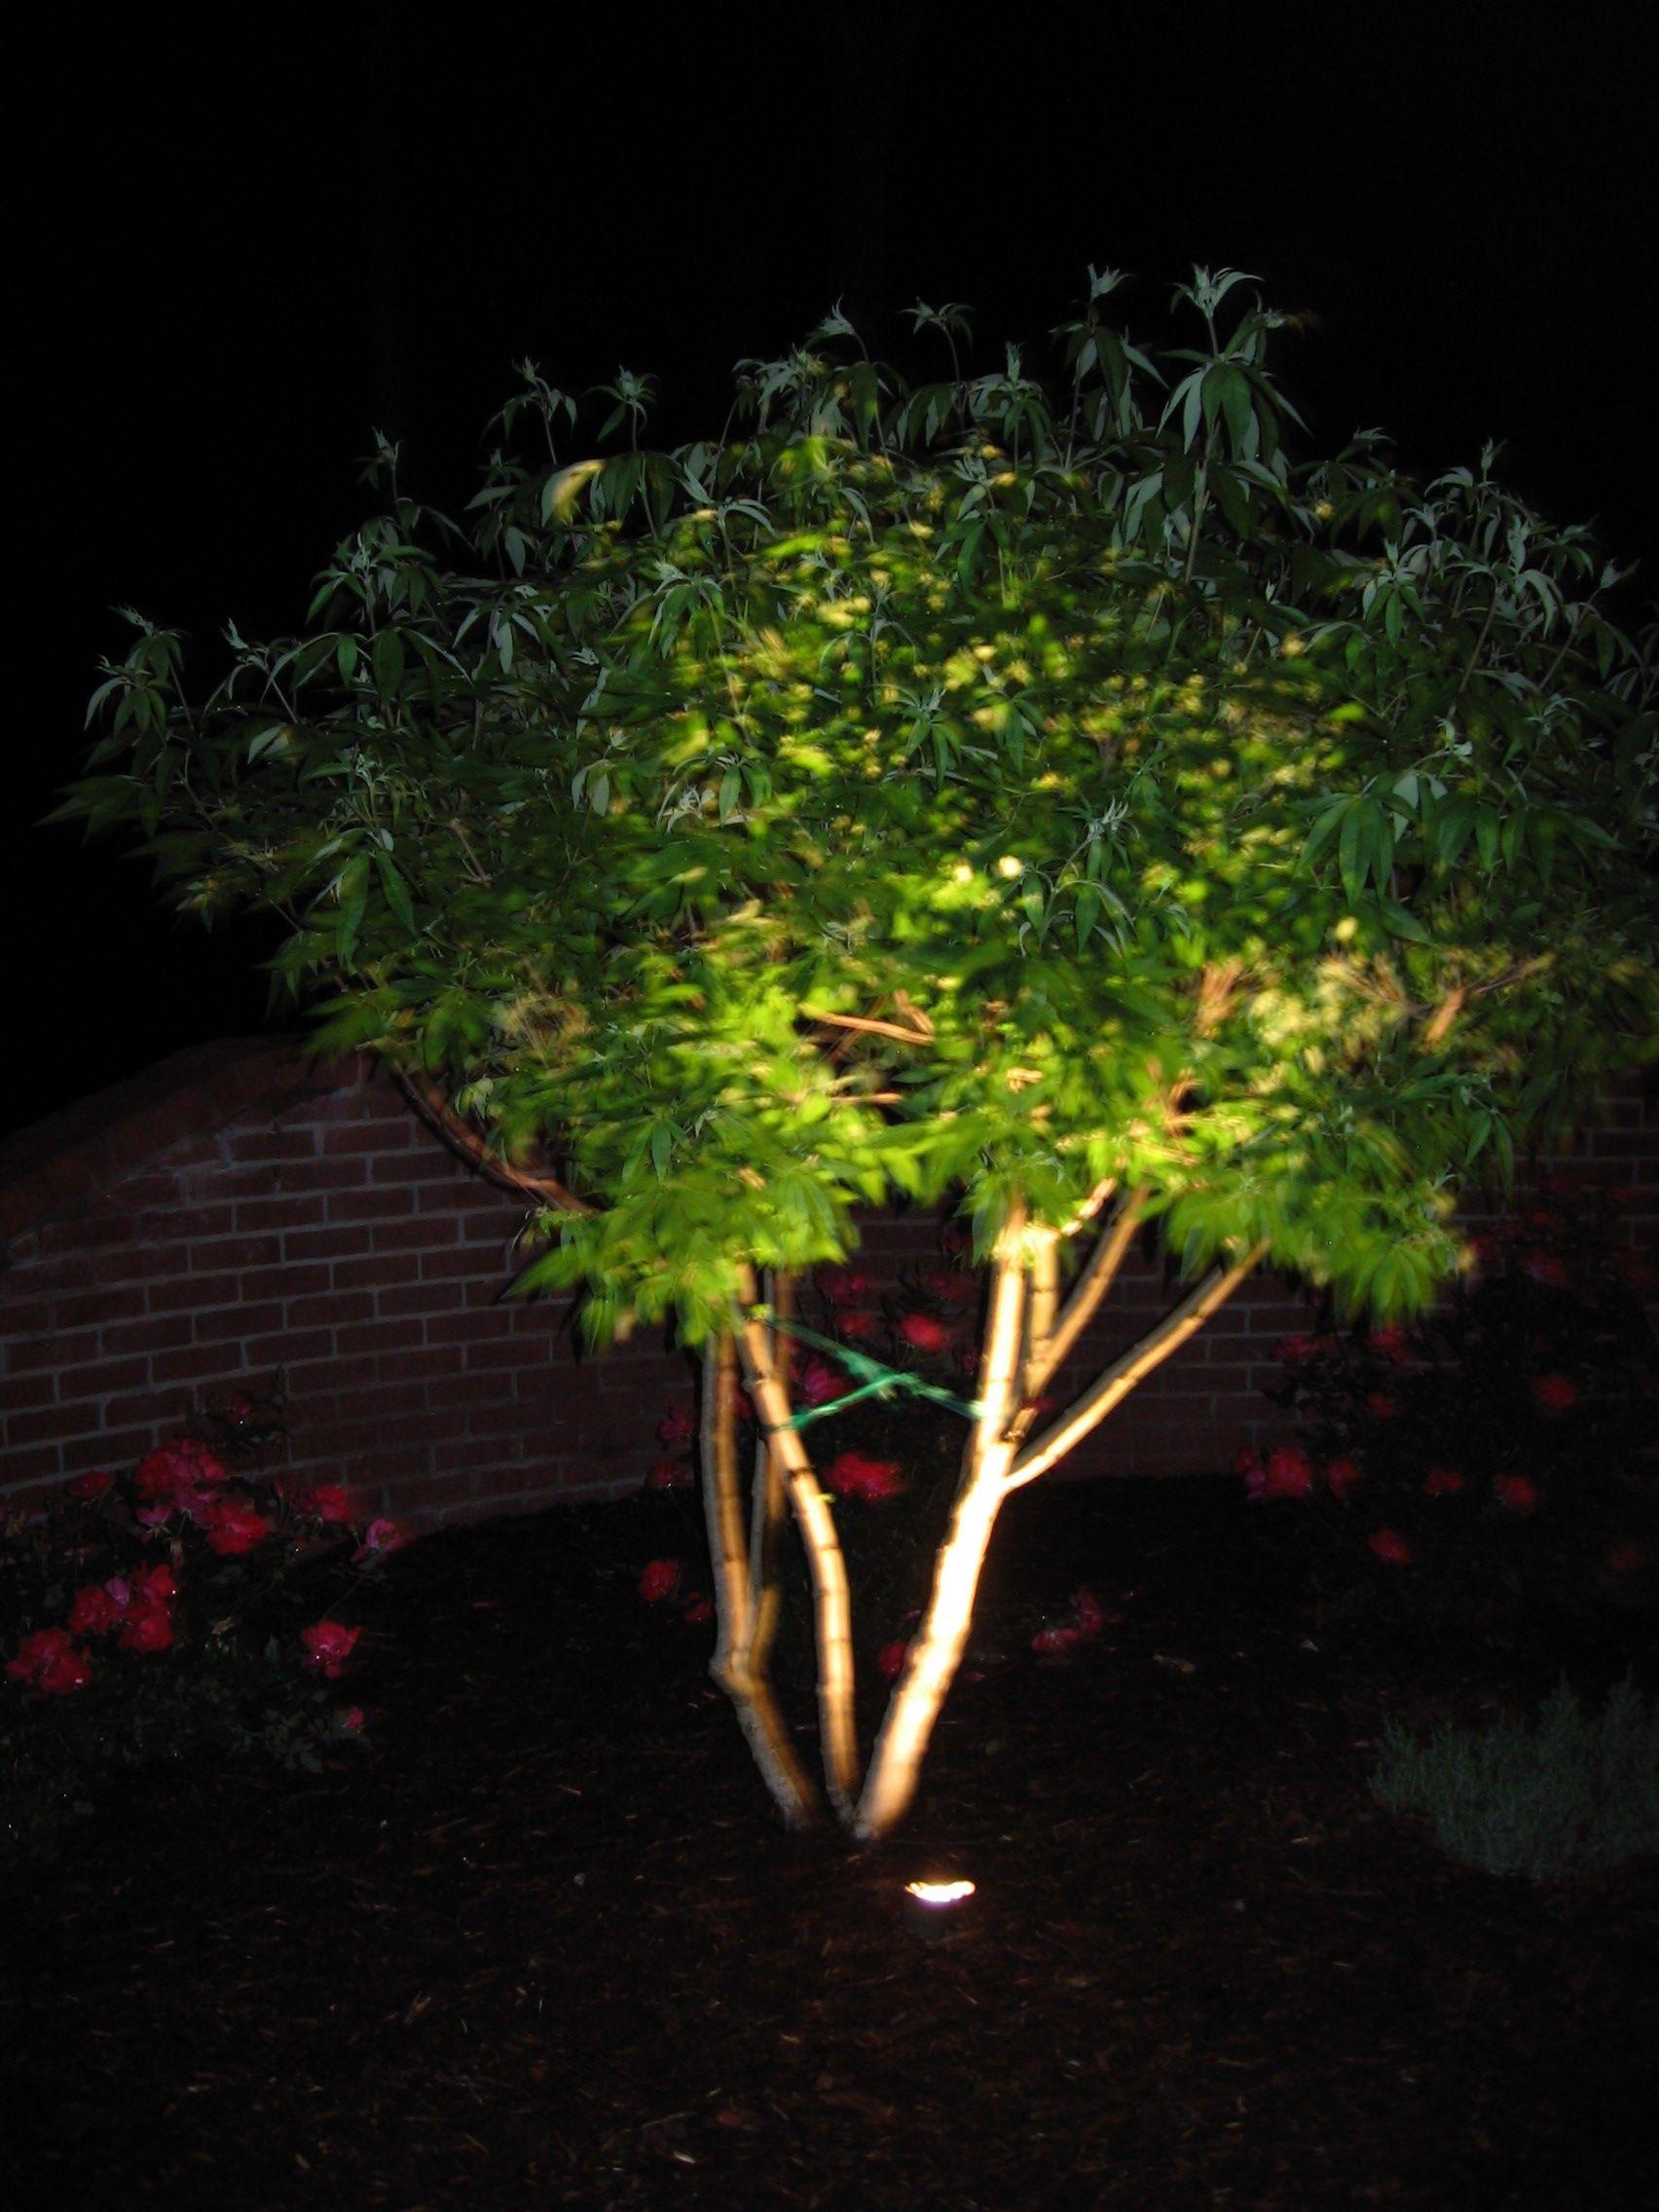 uplit tree instead of twinkle lights since you like some